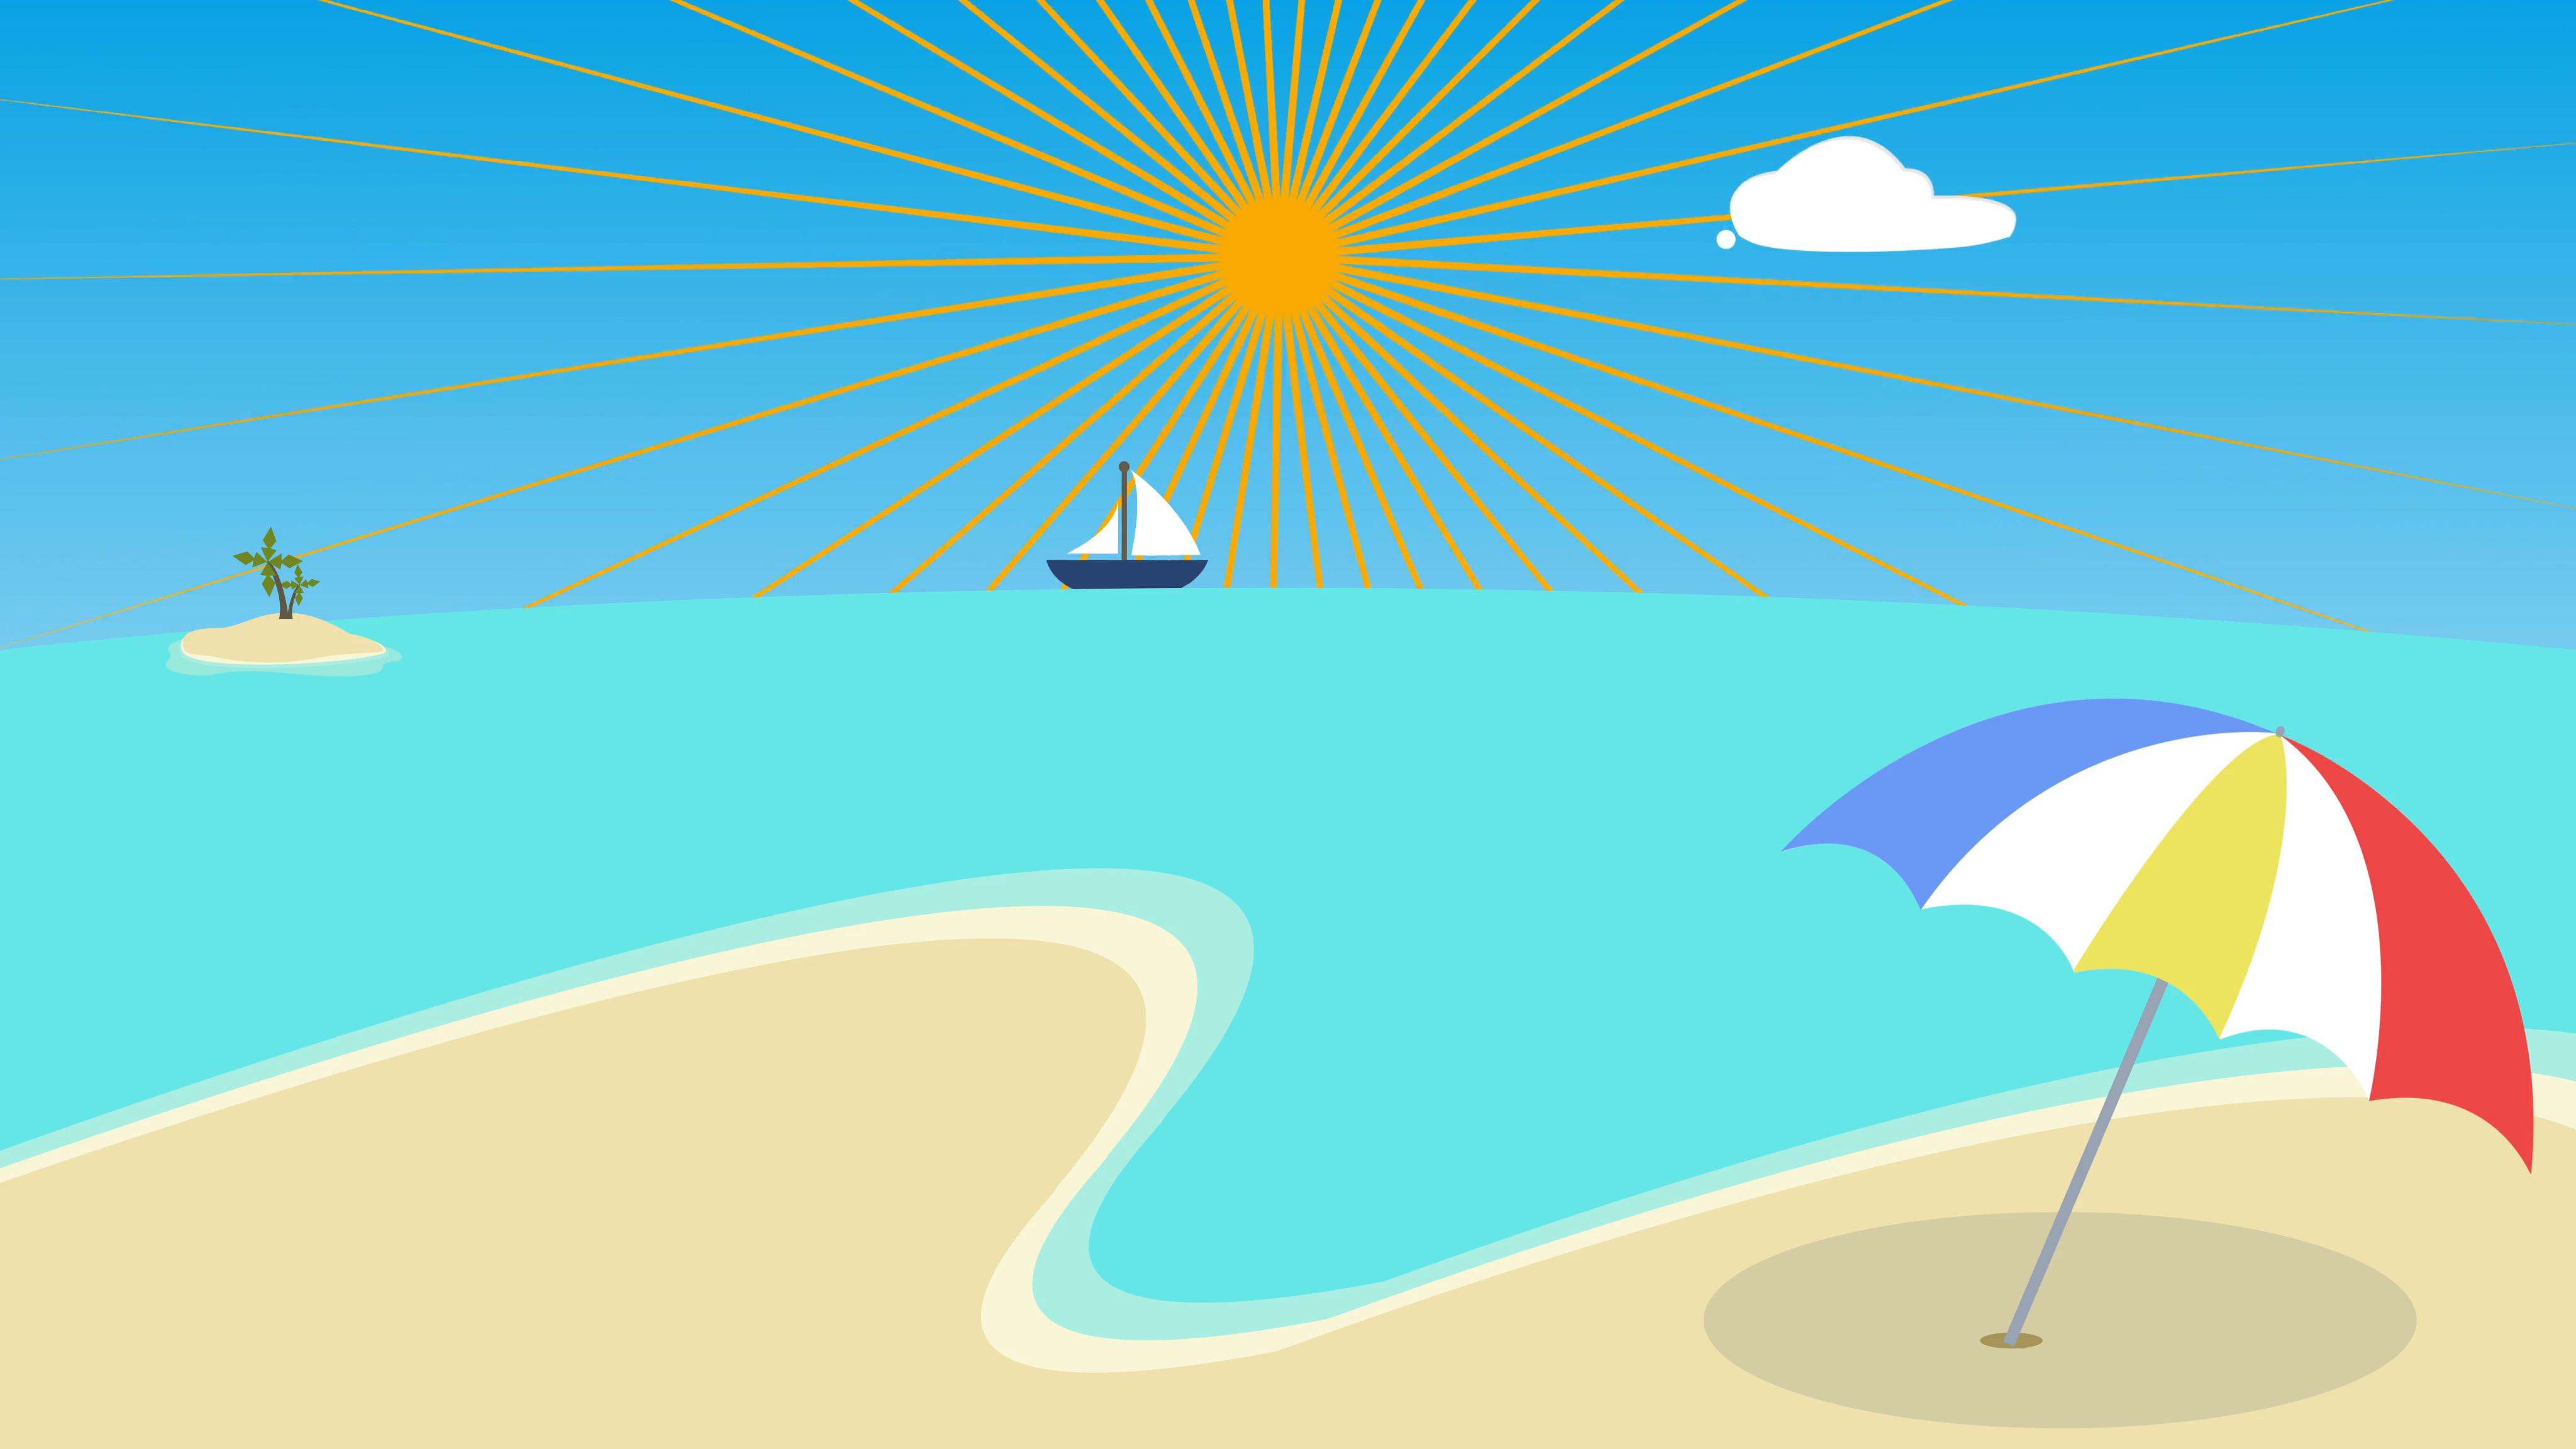 4096x2304 Colorful Cartoon Beach Background, Palm Beach Animation. Tropical